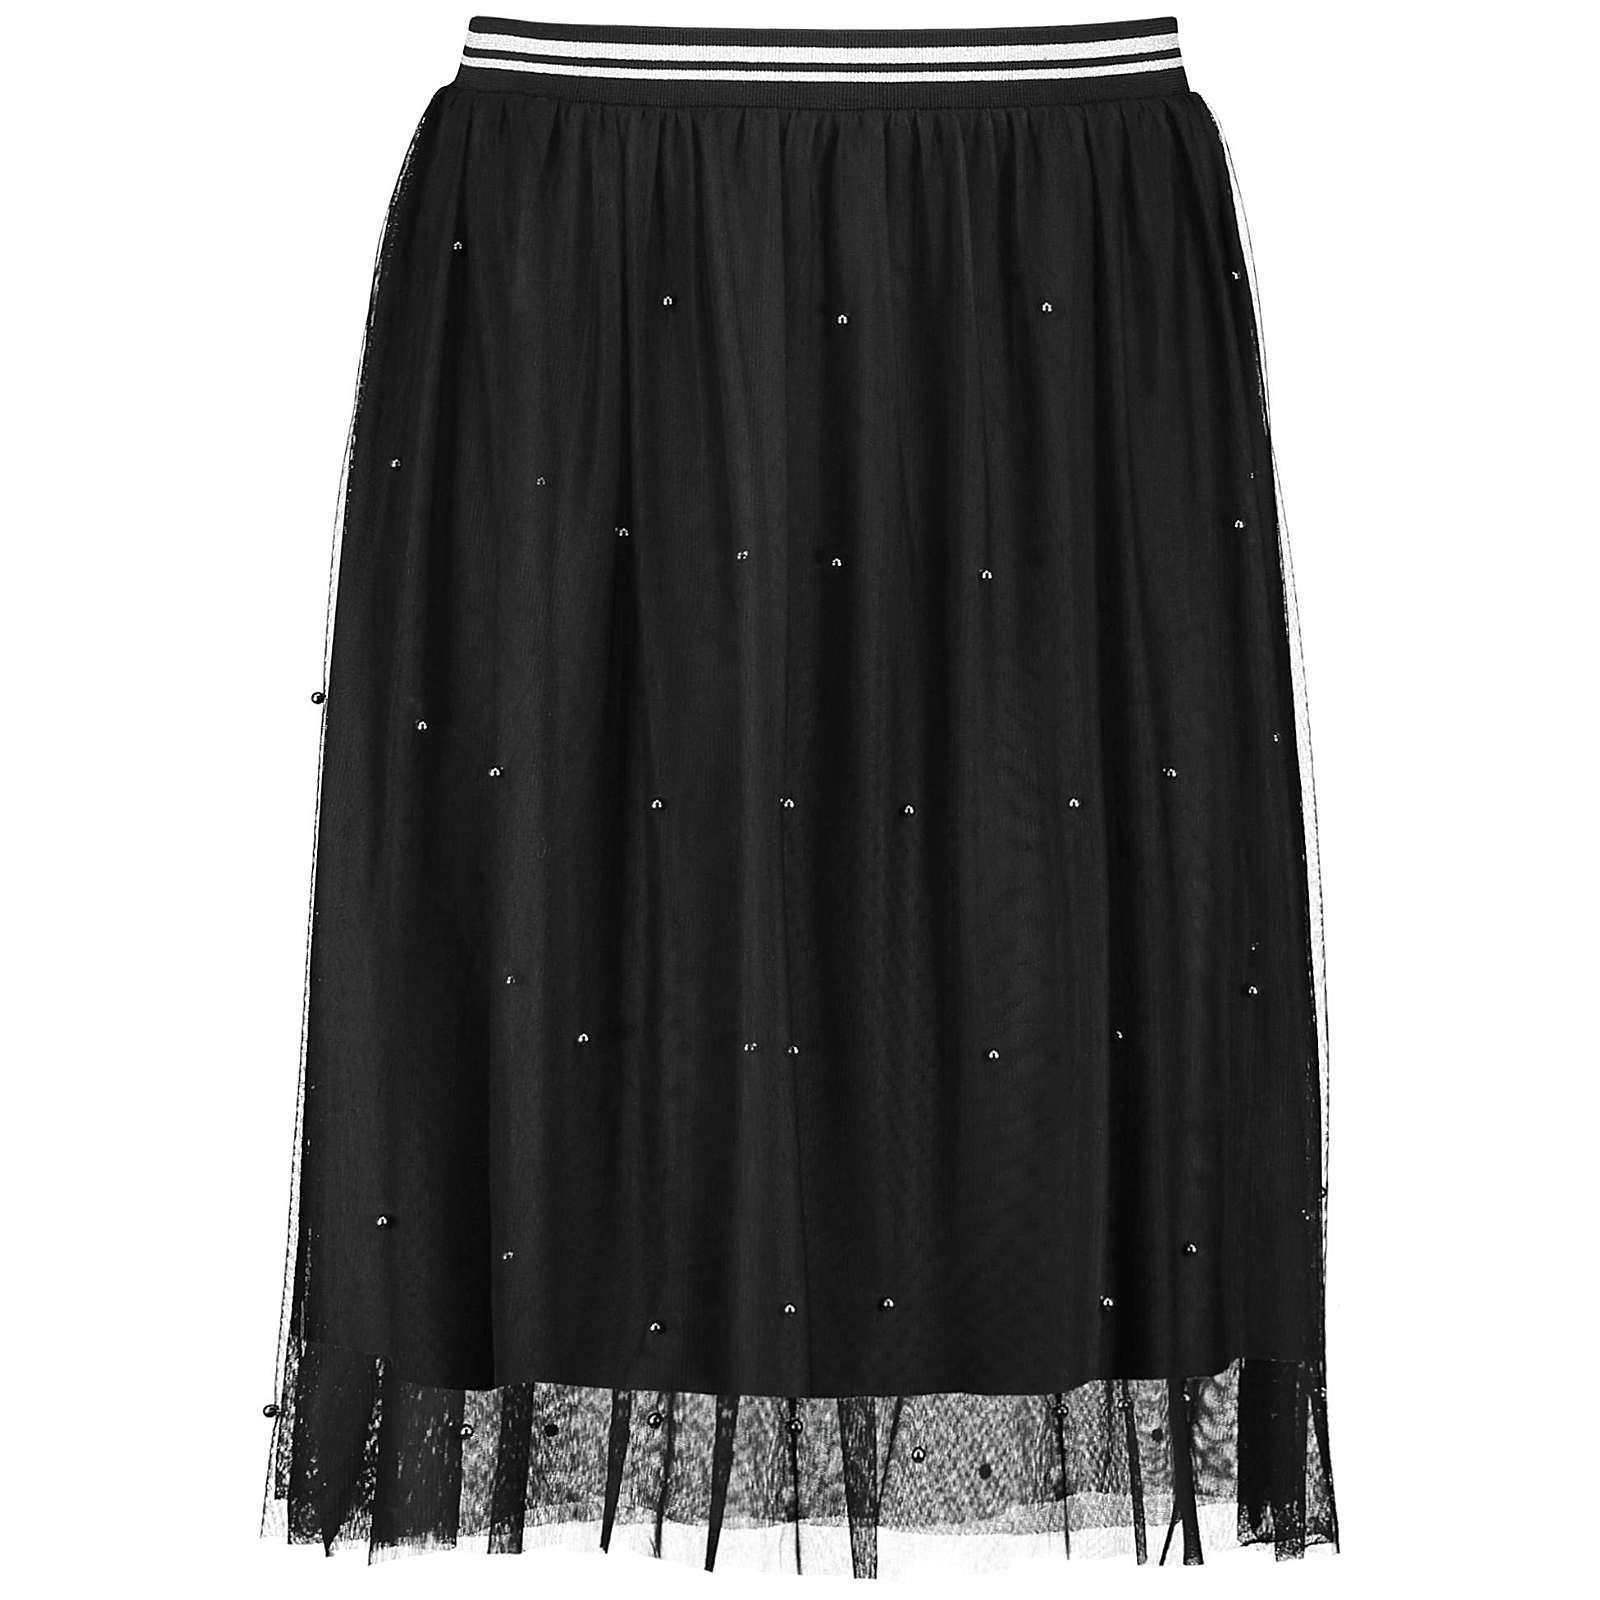 Samoon Rock Gewirke Tüllrock mit Perlen Röcke schwarz Damen Gr. 48